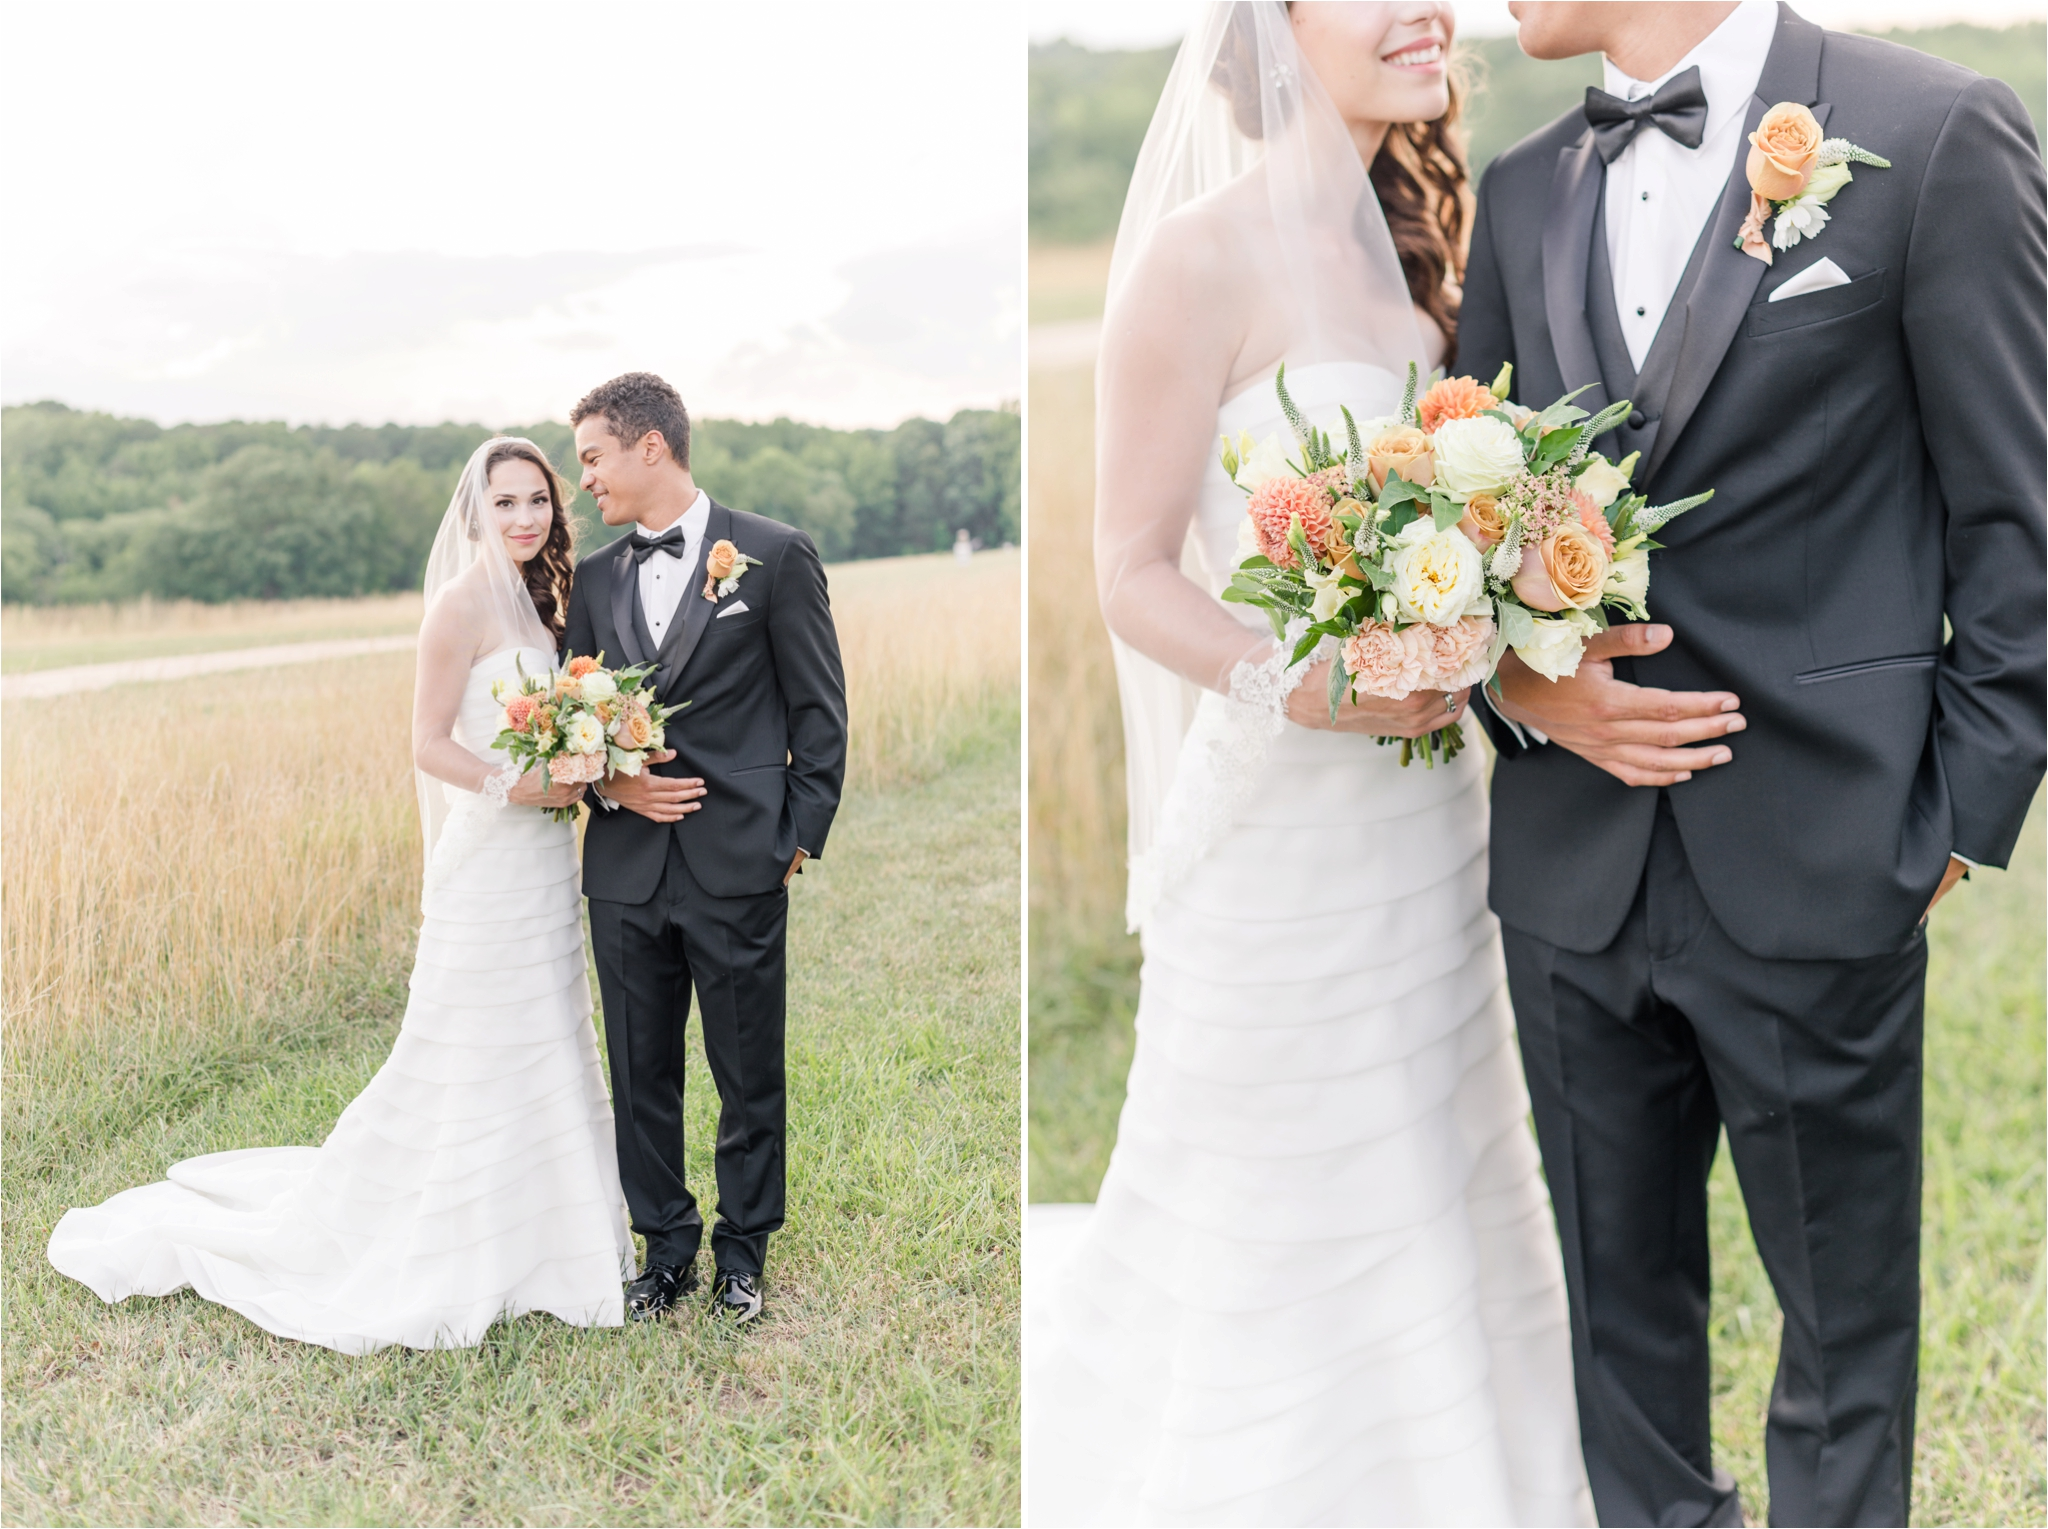 Classic Bride And Groom Portraits Raleigh North Carolina Wedding Photographer Jaclyn Auletta Photography